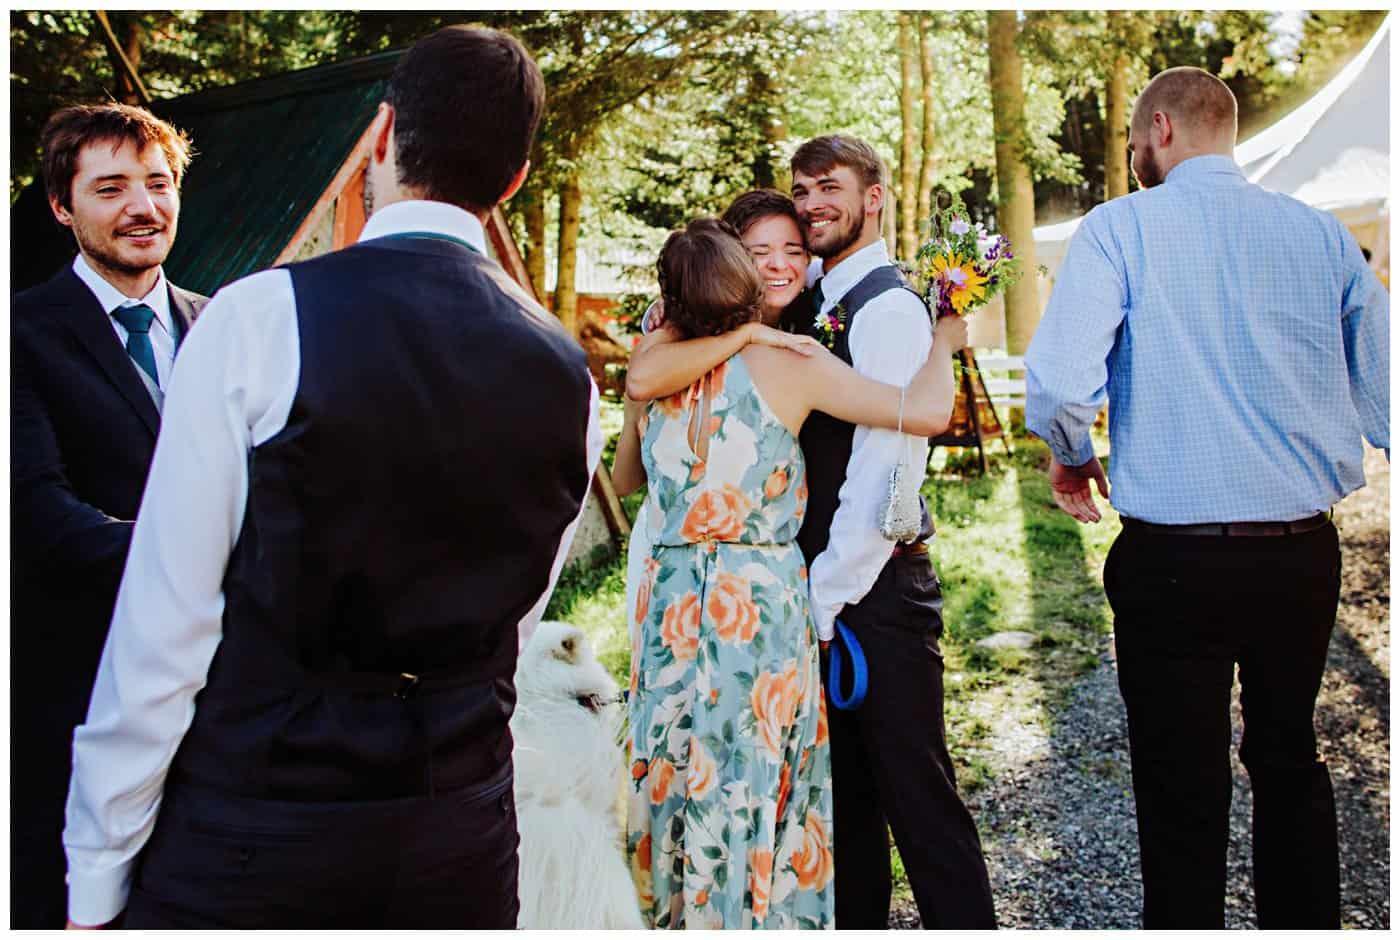 la toundra wedding photographer